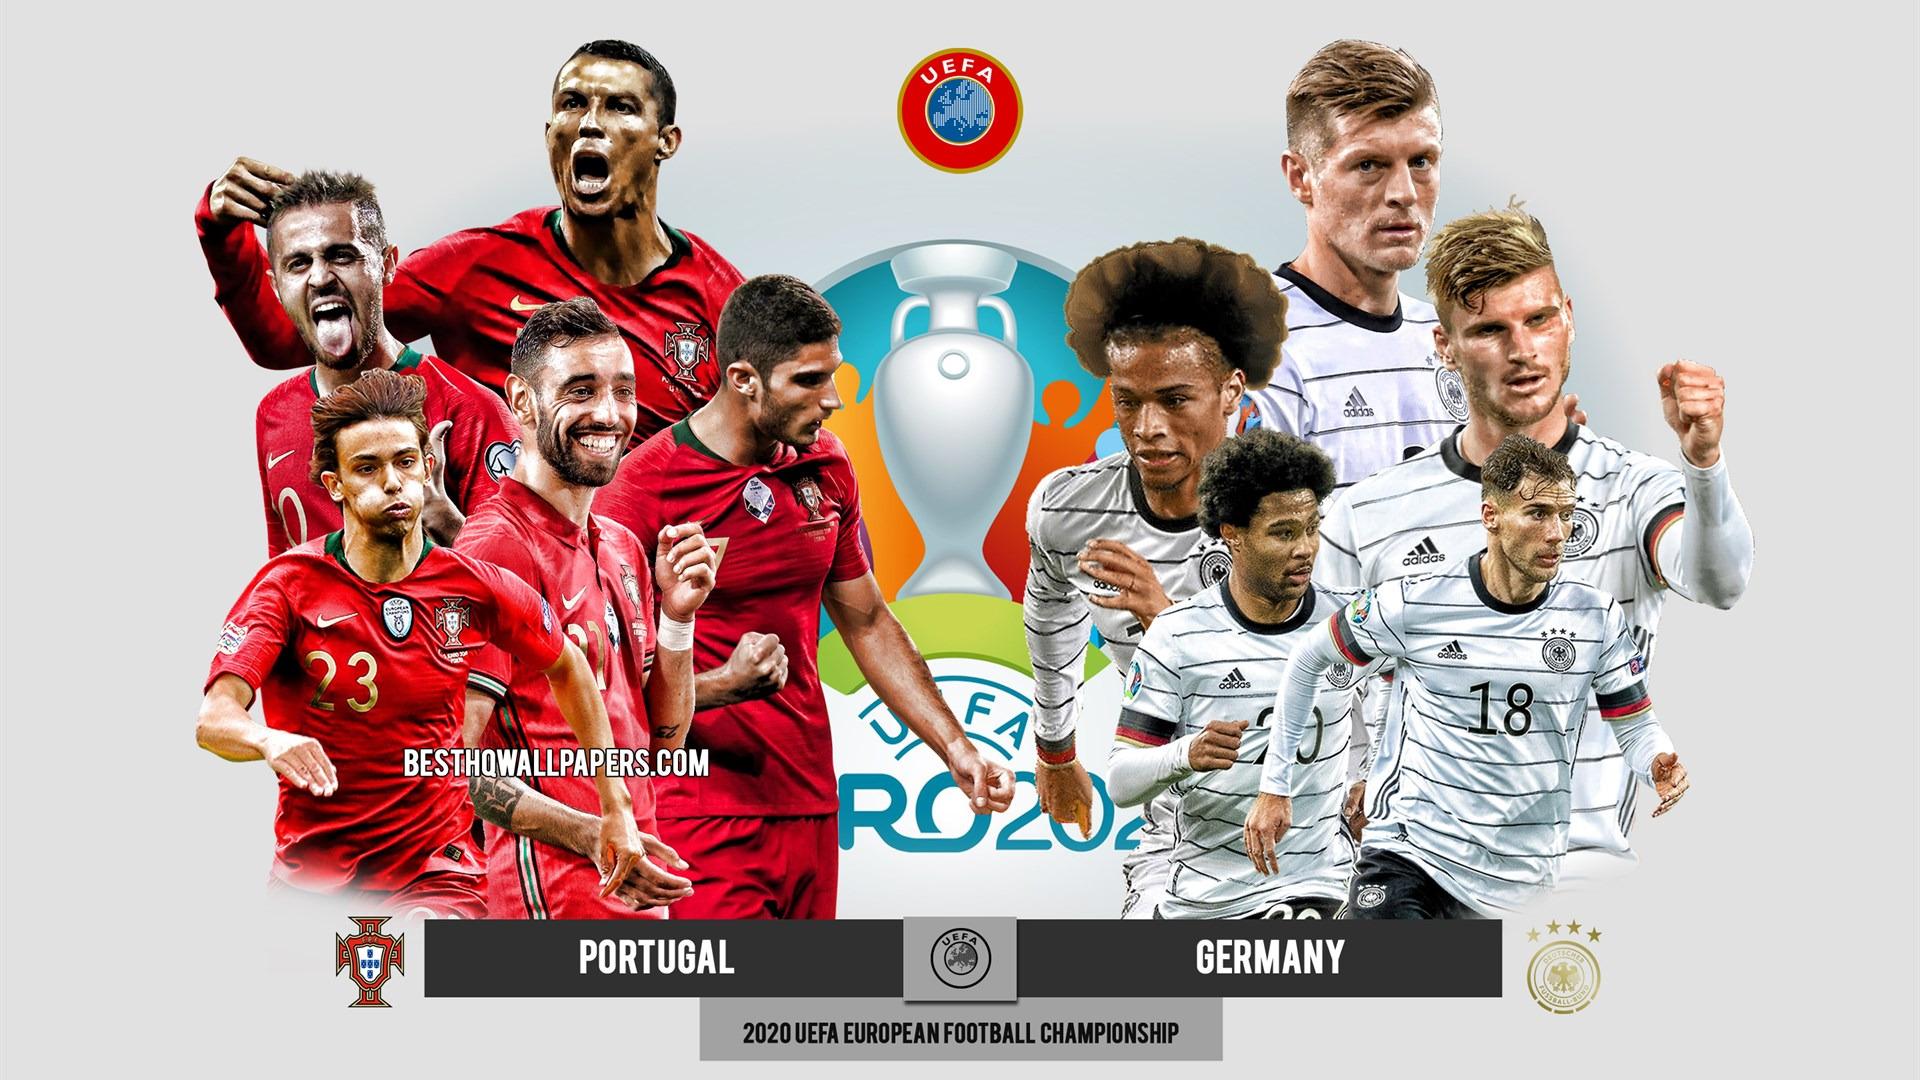 Чемпионат Европы по футболу 2020 — s01e23 — Группа F. 2-й тур: Португалия— Германия